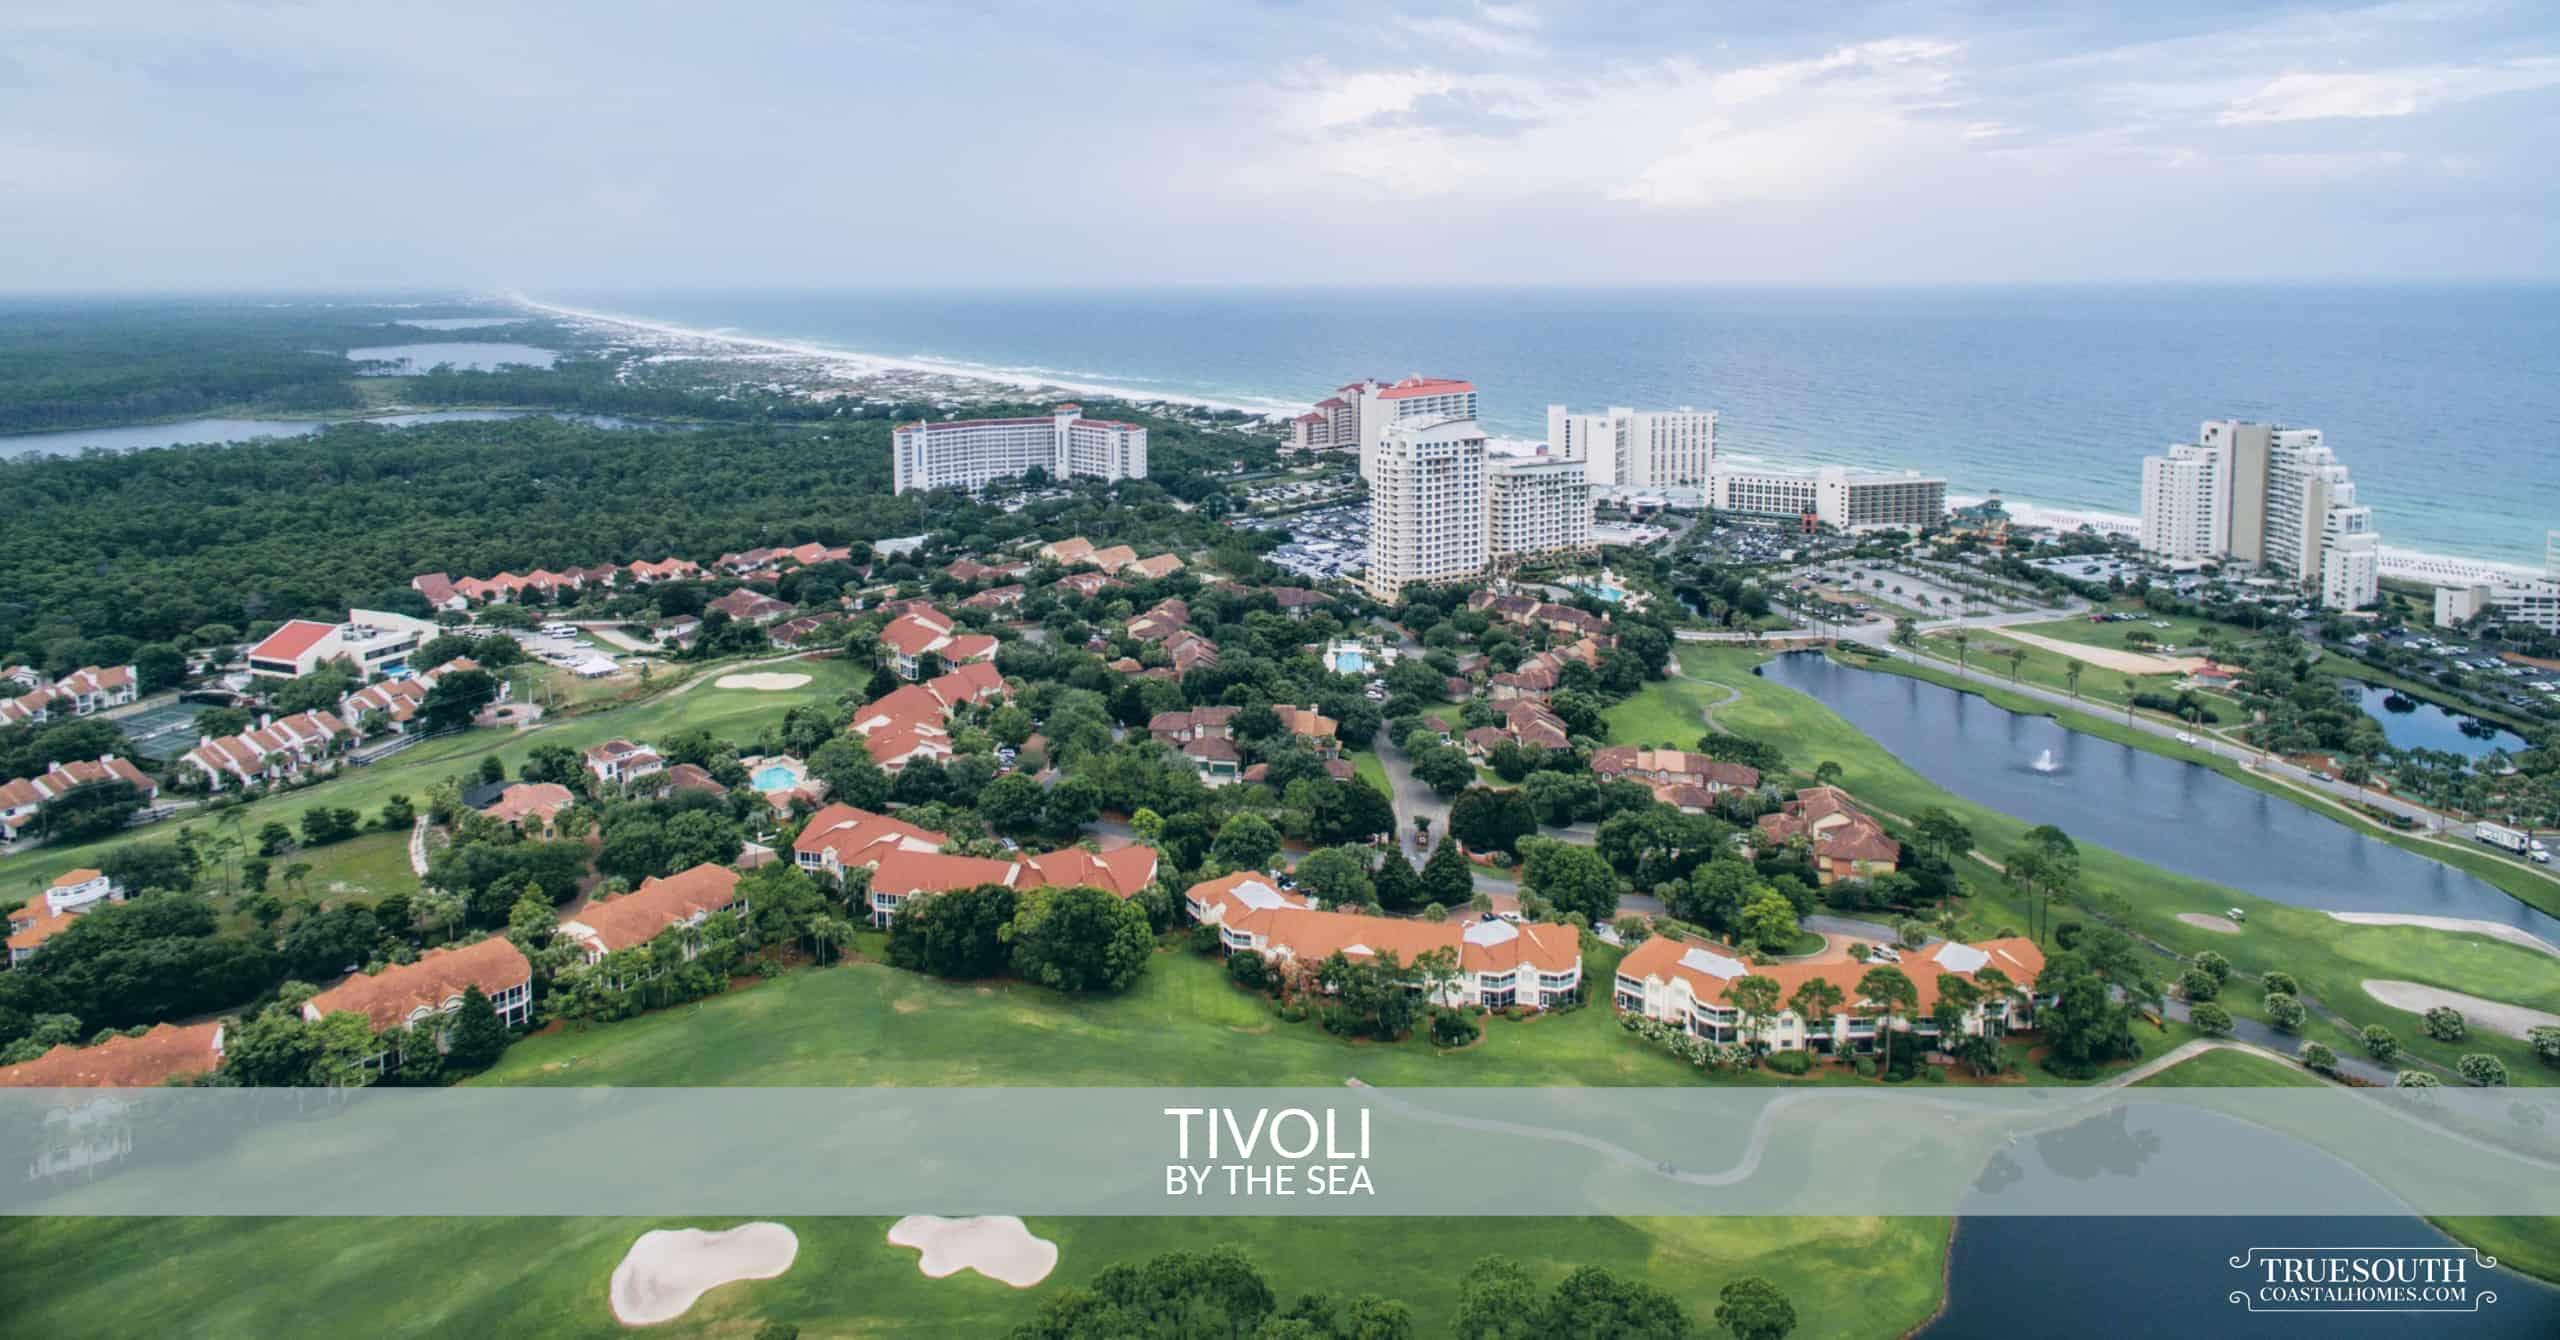 Tivoli By the Sea Aerial